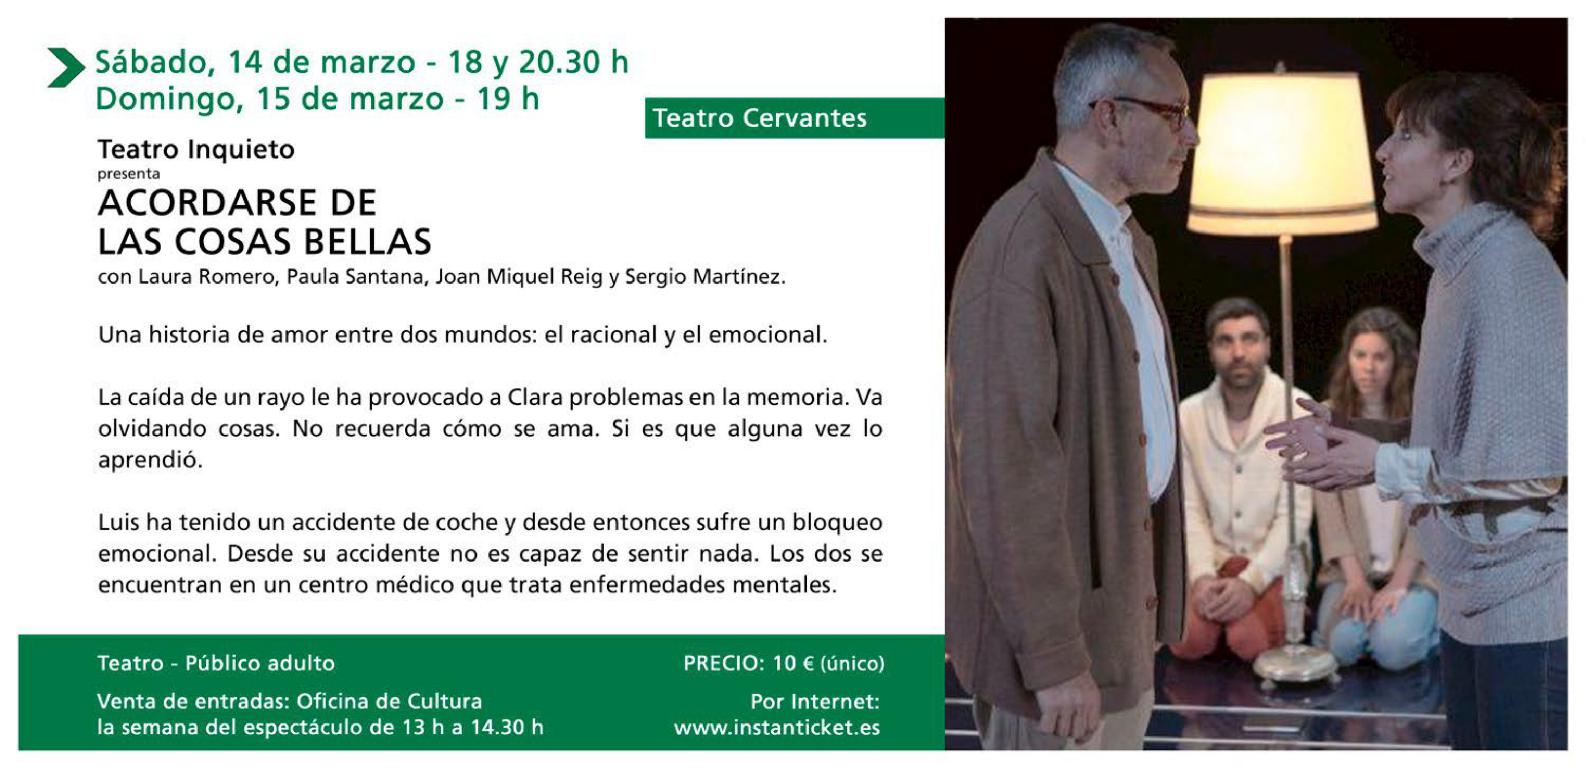 Programacin-Teatro-Cervantes-2020_page-0007.jpg